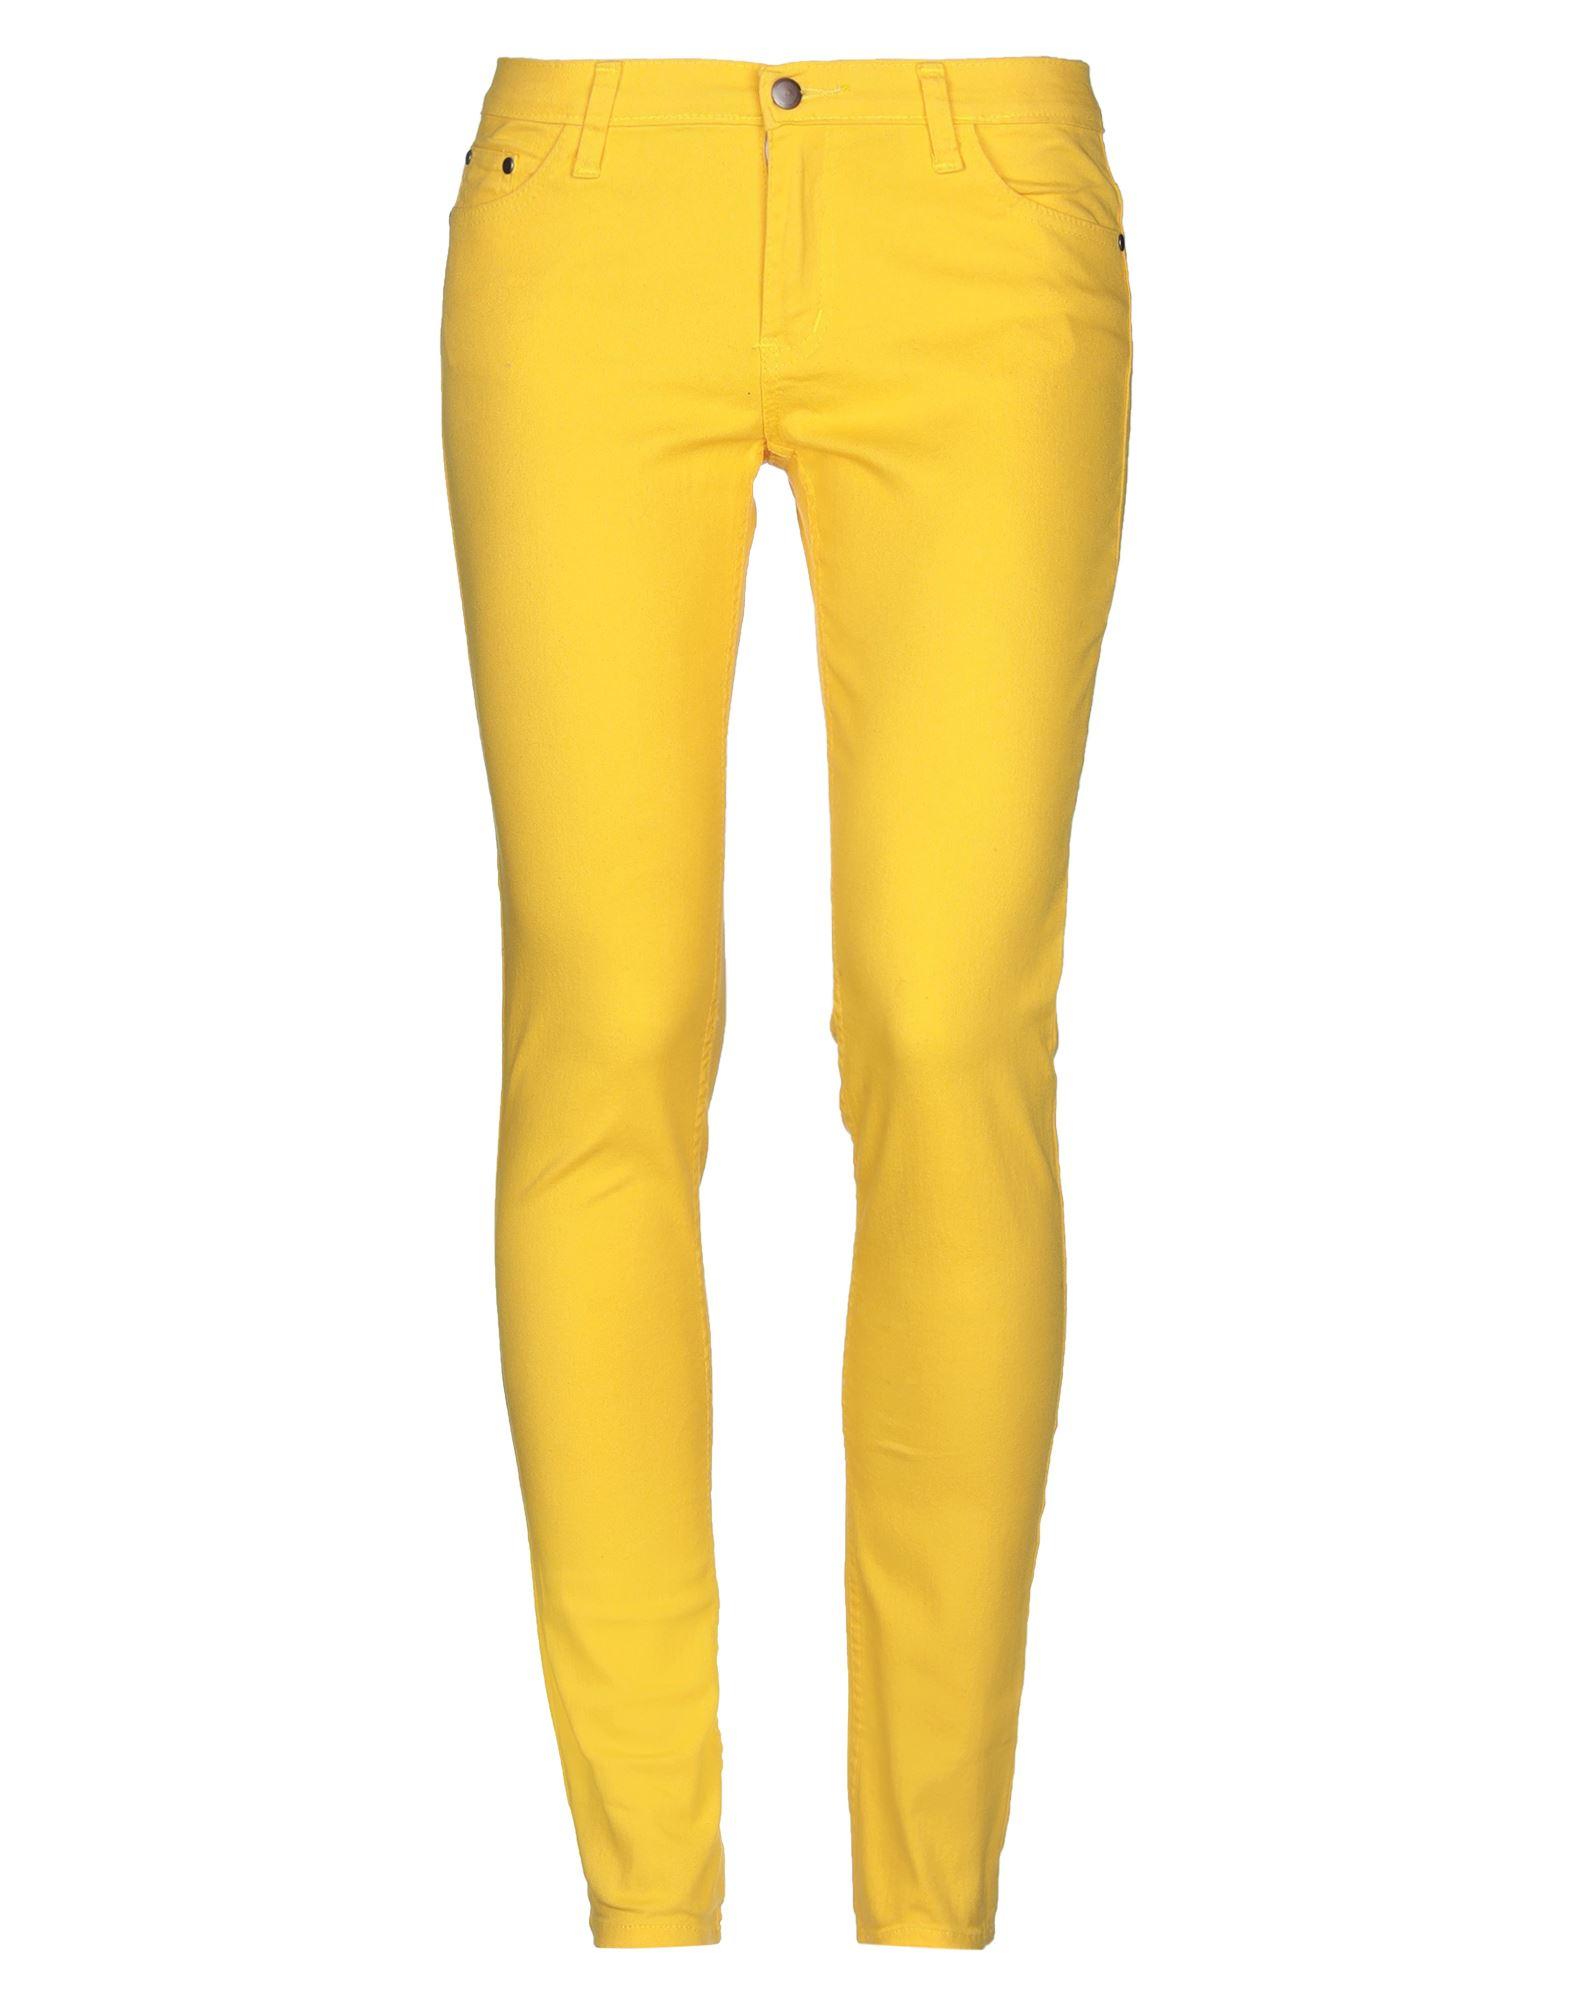 COMPAÑIA FANTASTICA Джинсовые брюки compañia fantastica джинсовые шорты